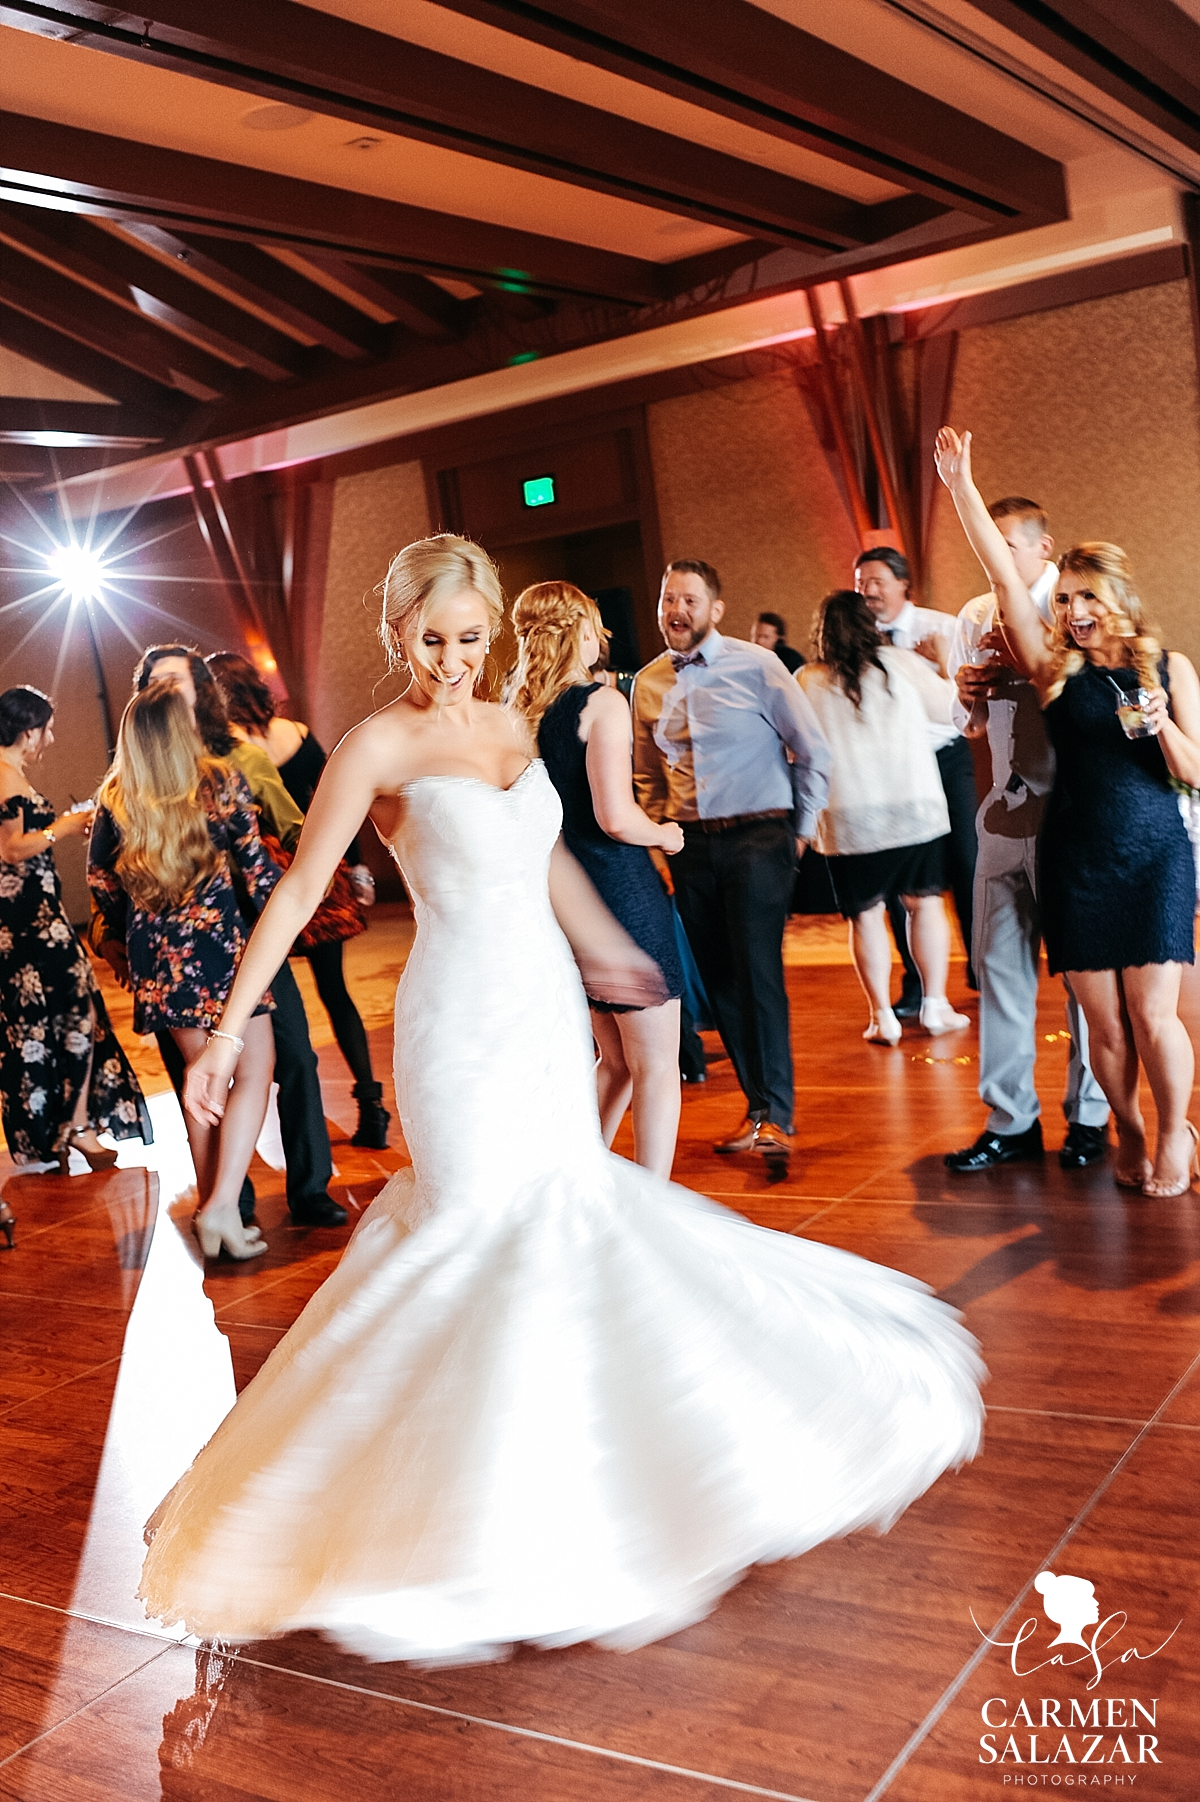 Candid wedding dancefloor photographer - Carmen Salazar